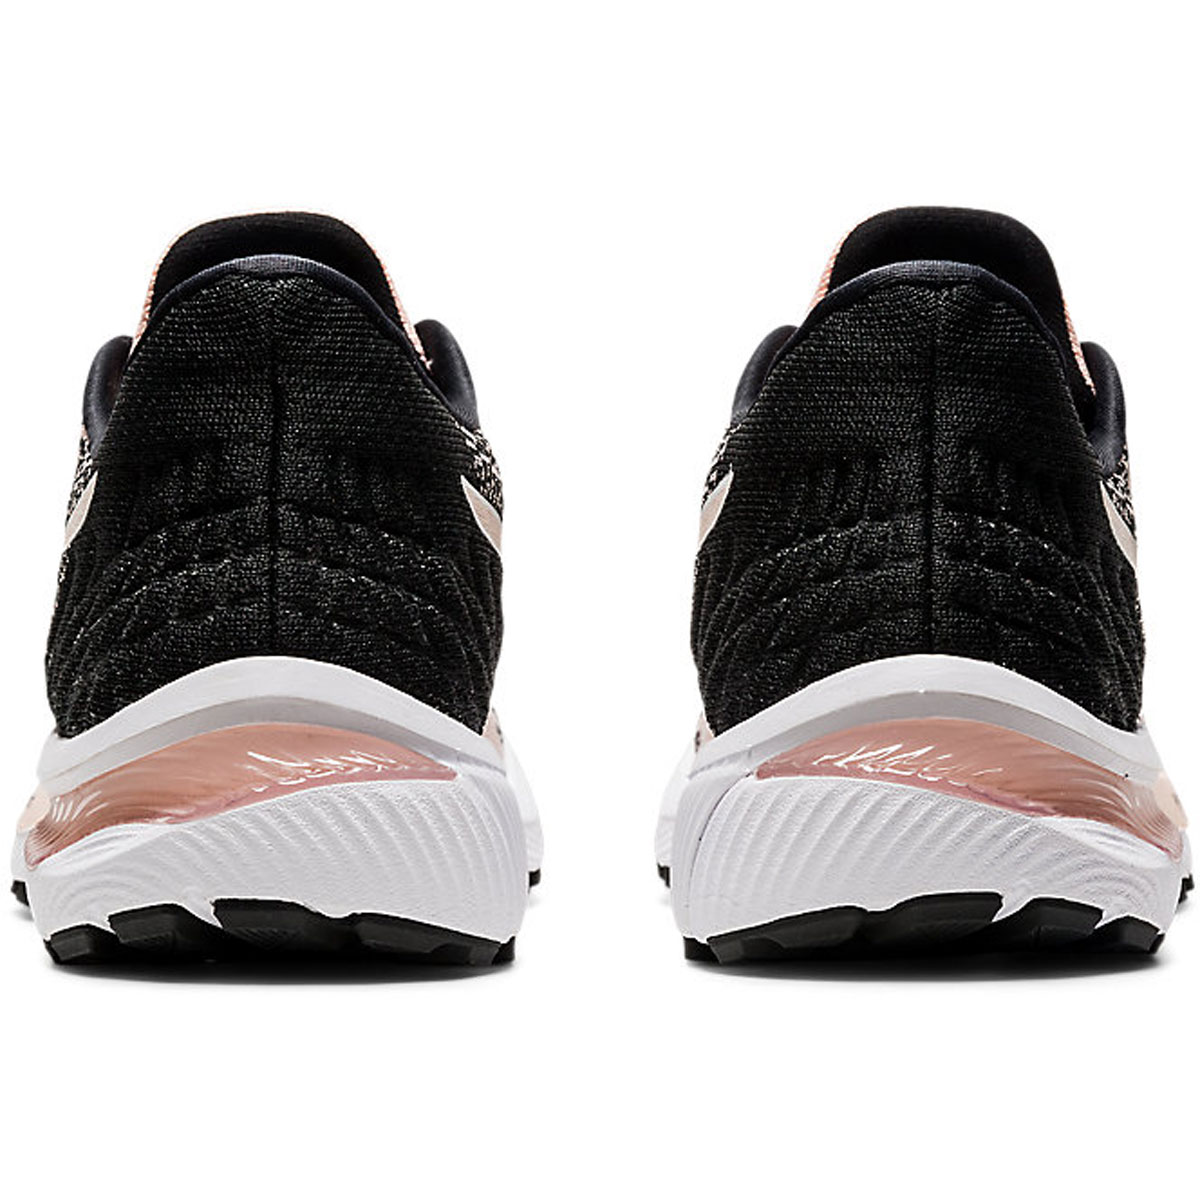 Women's Asics Gel-Cumulus 22 Knit Running Shoe - Color: Breeze/Black - Size: 5 - Width: Regular, Breeze/Black, large, image 5